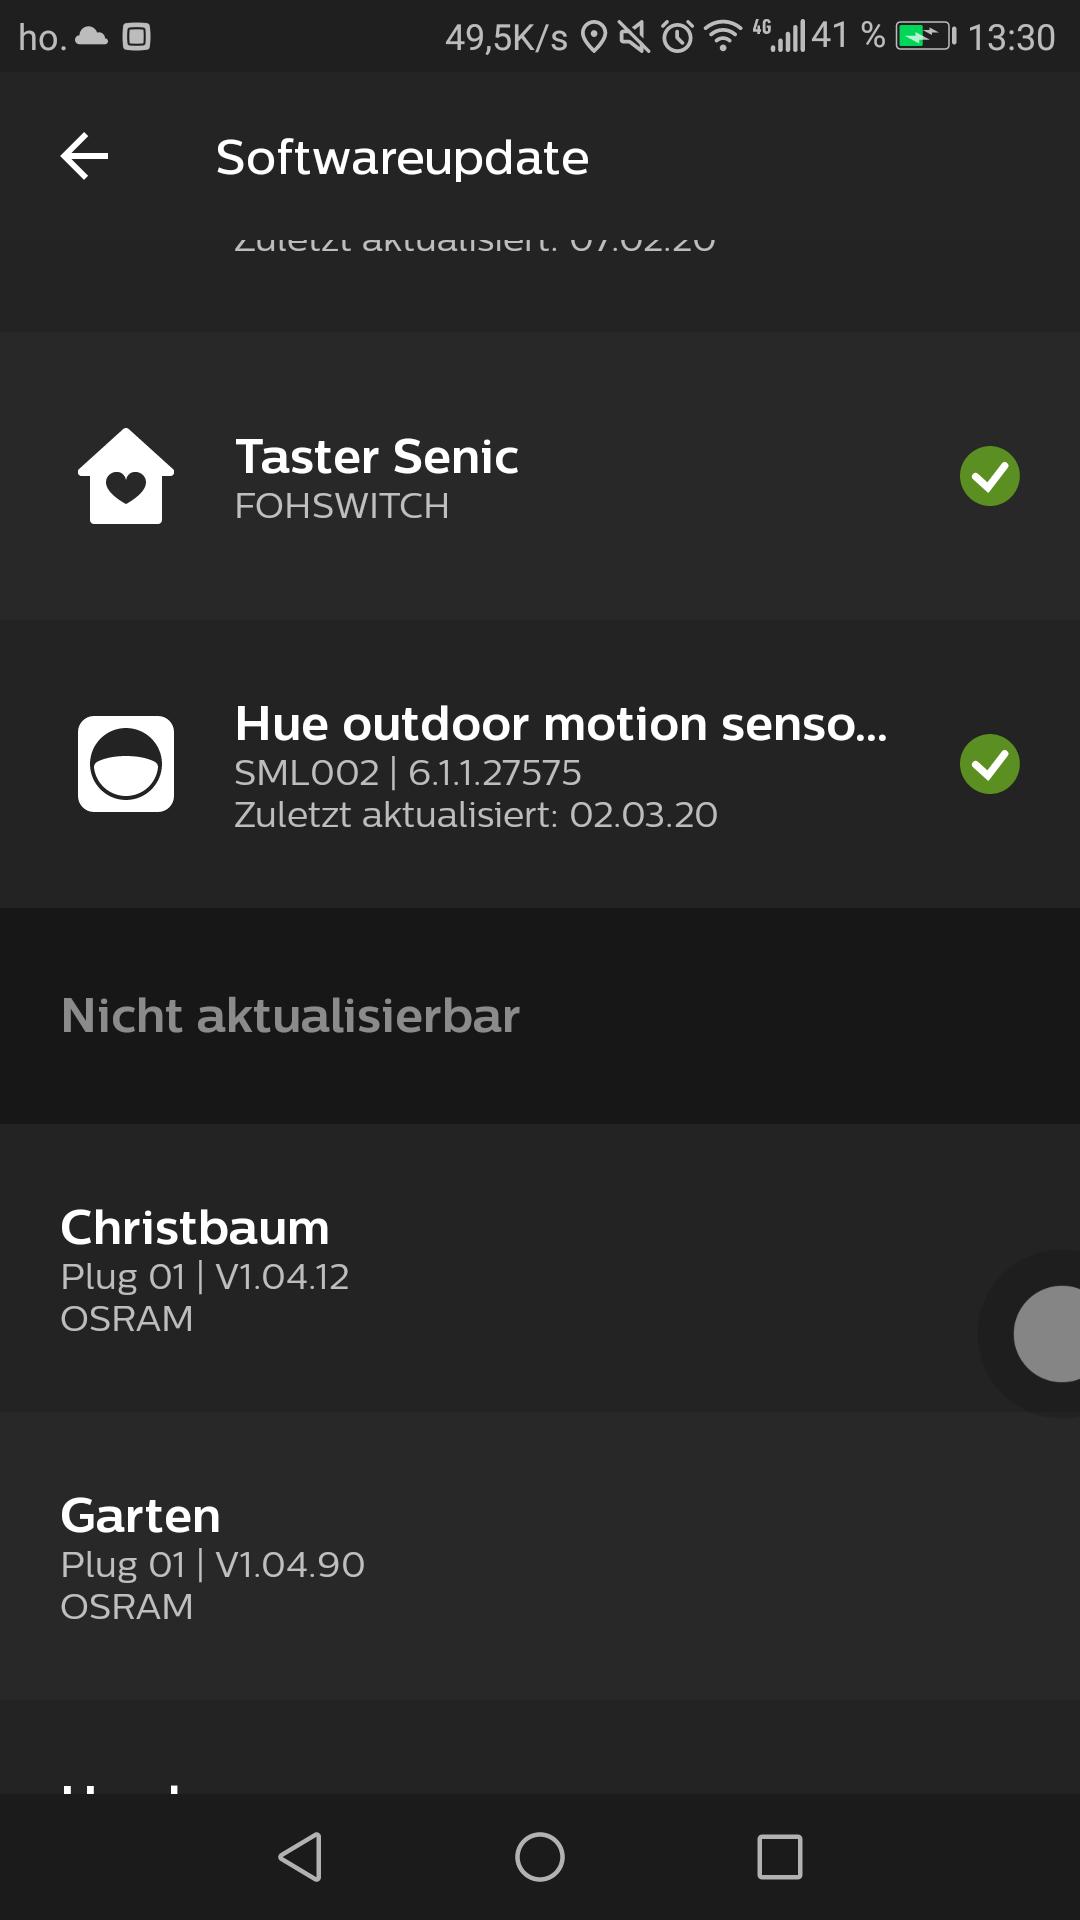 Screenshot_20200411-133019